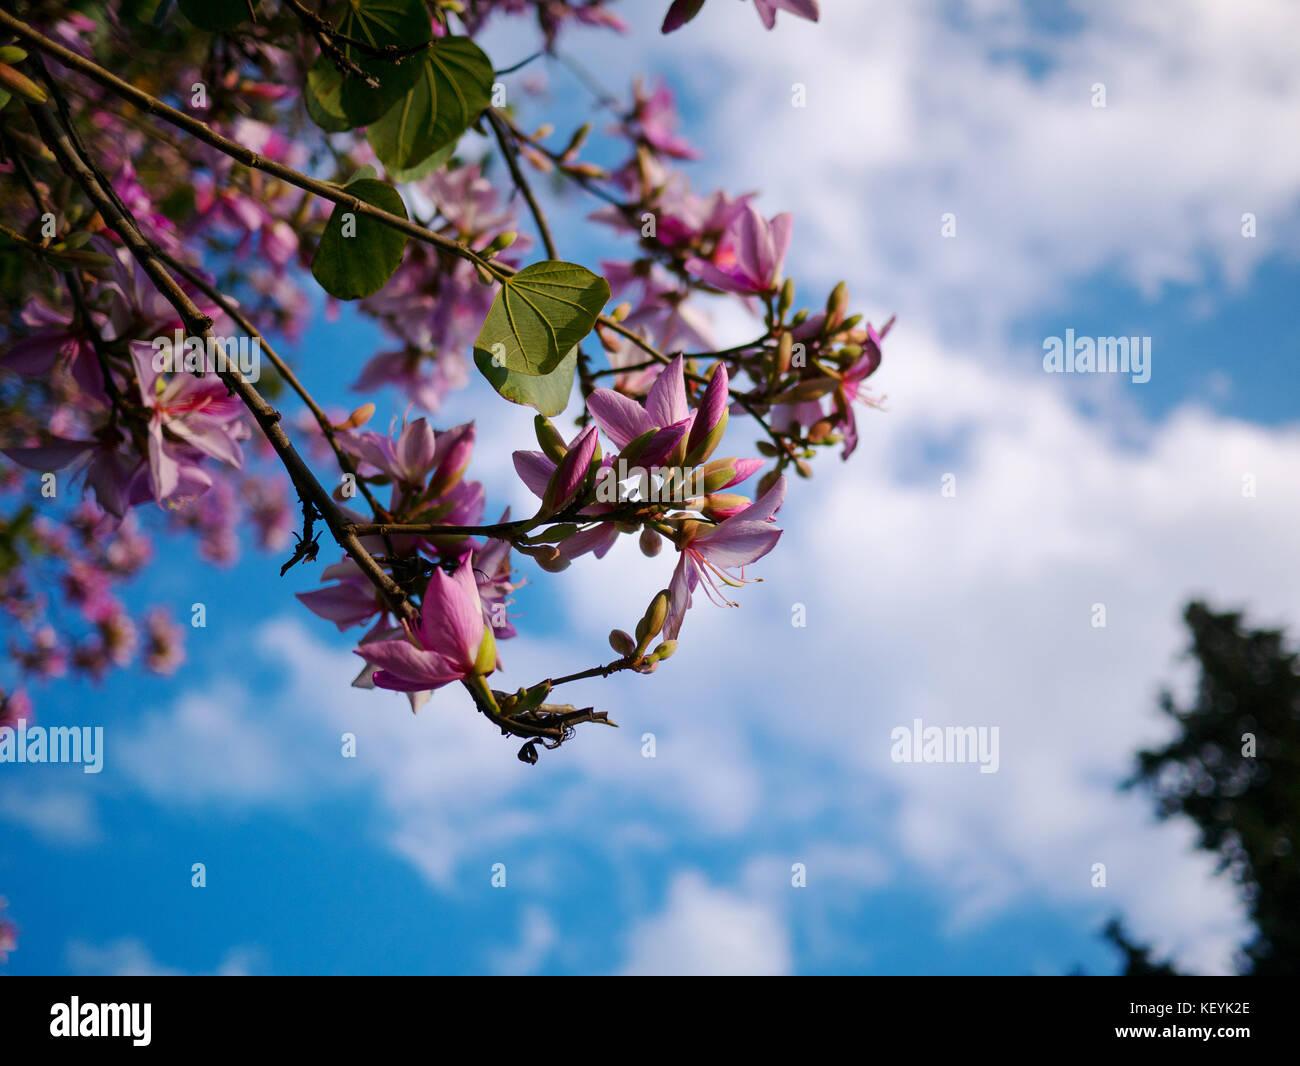 Pink flower on acacia tree with blue sky stock photo 164106166 alamy pink flower on acacia tree with blue sky izmirmasajfo